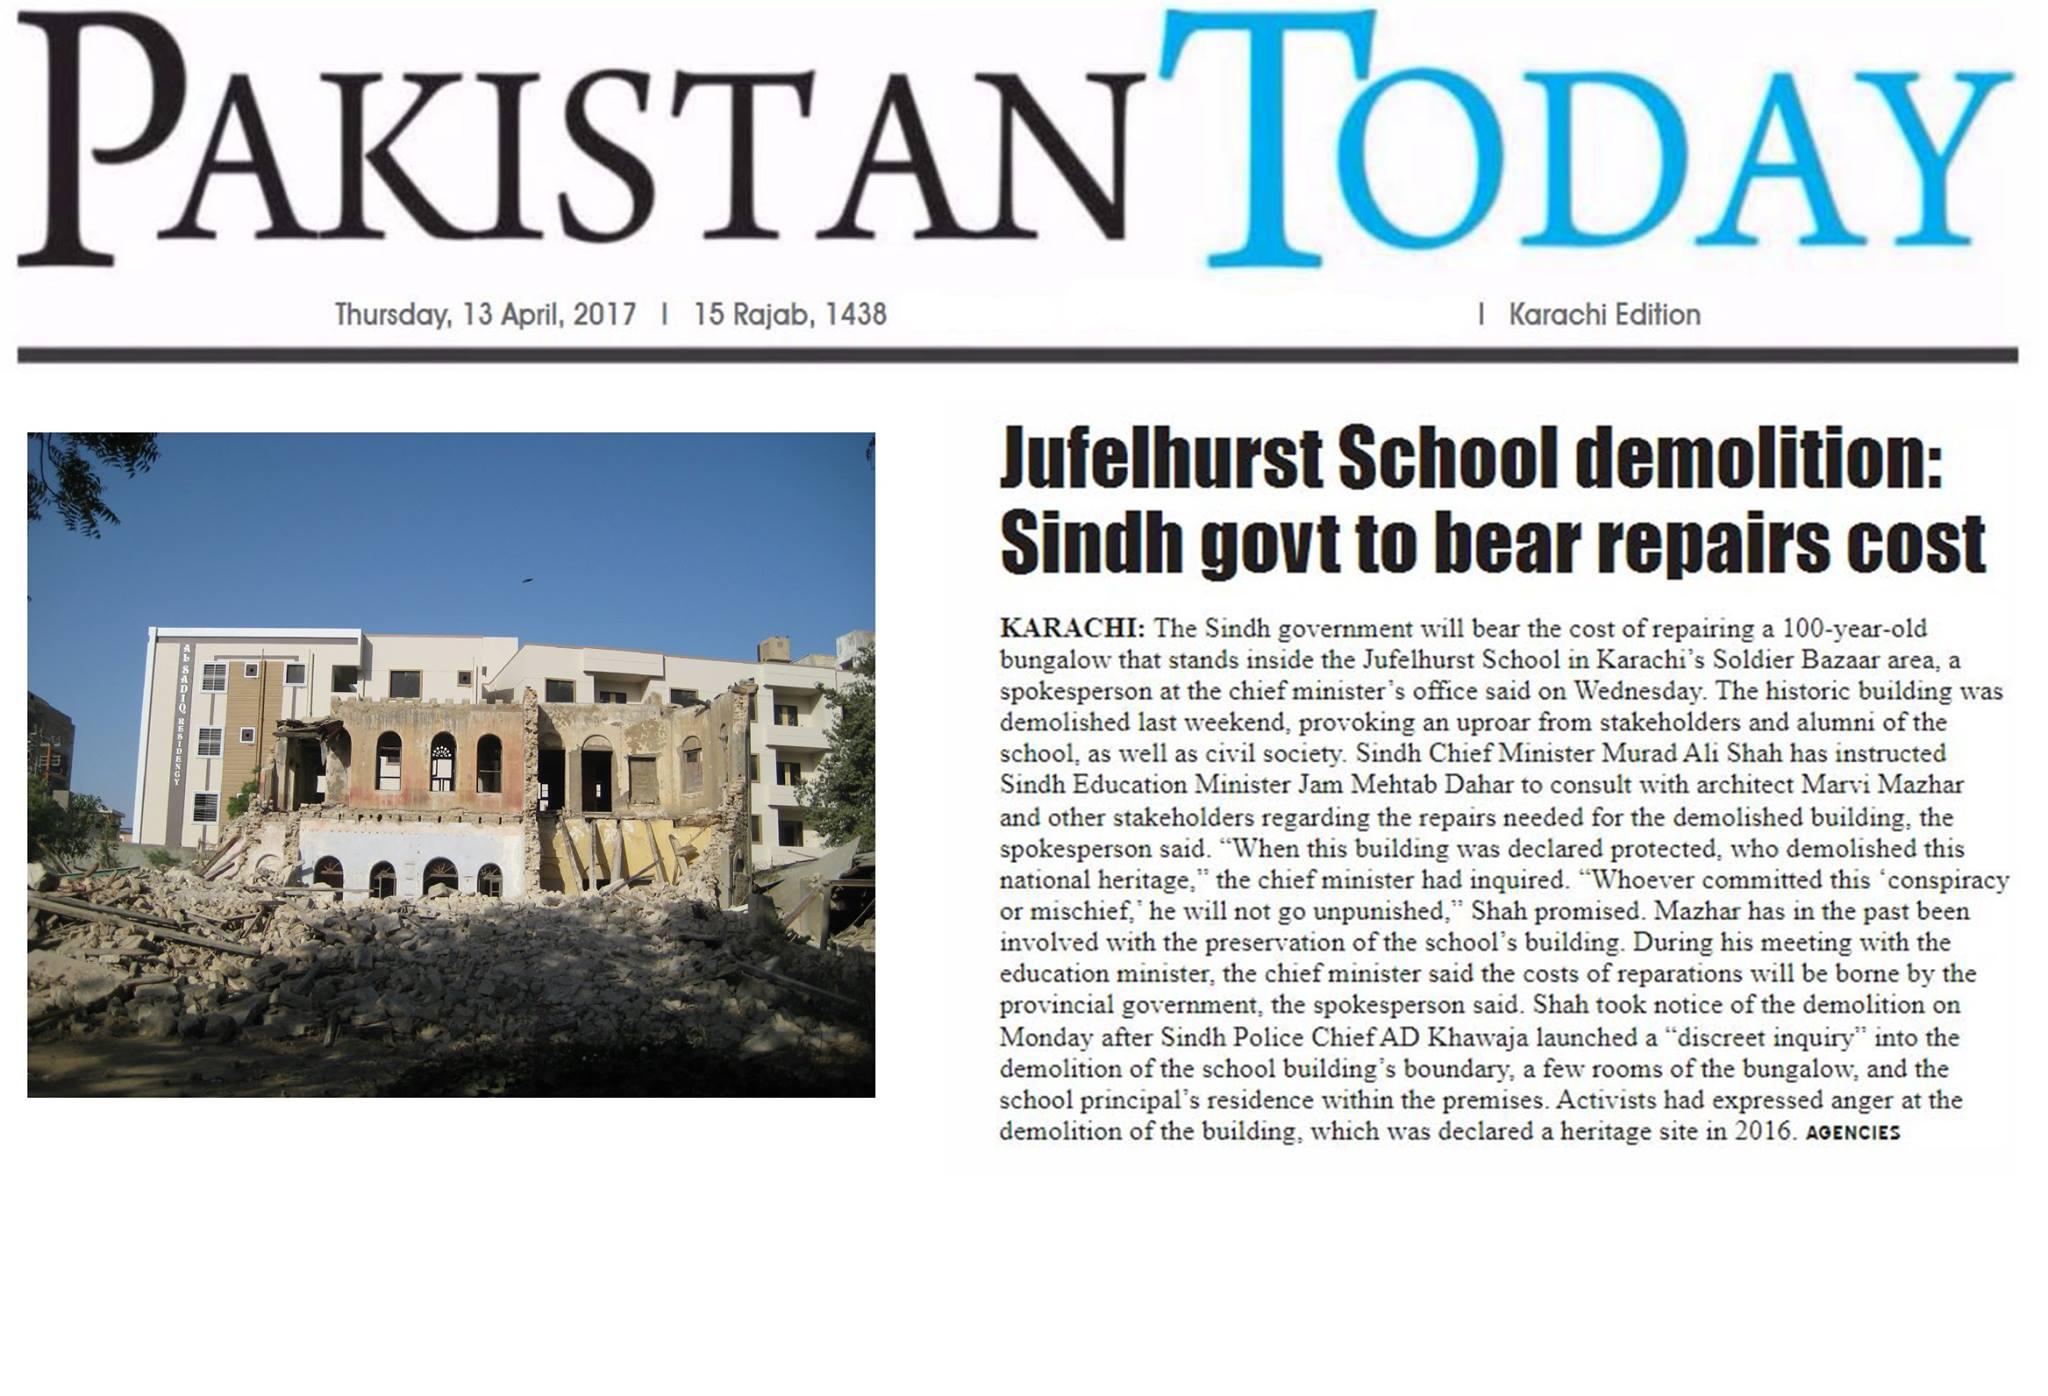 Jufelhurst High School  Rebuilding Plan Order from Sindh Government